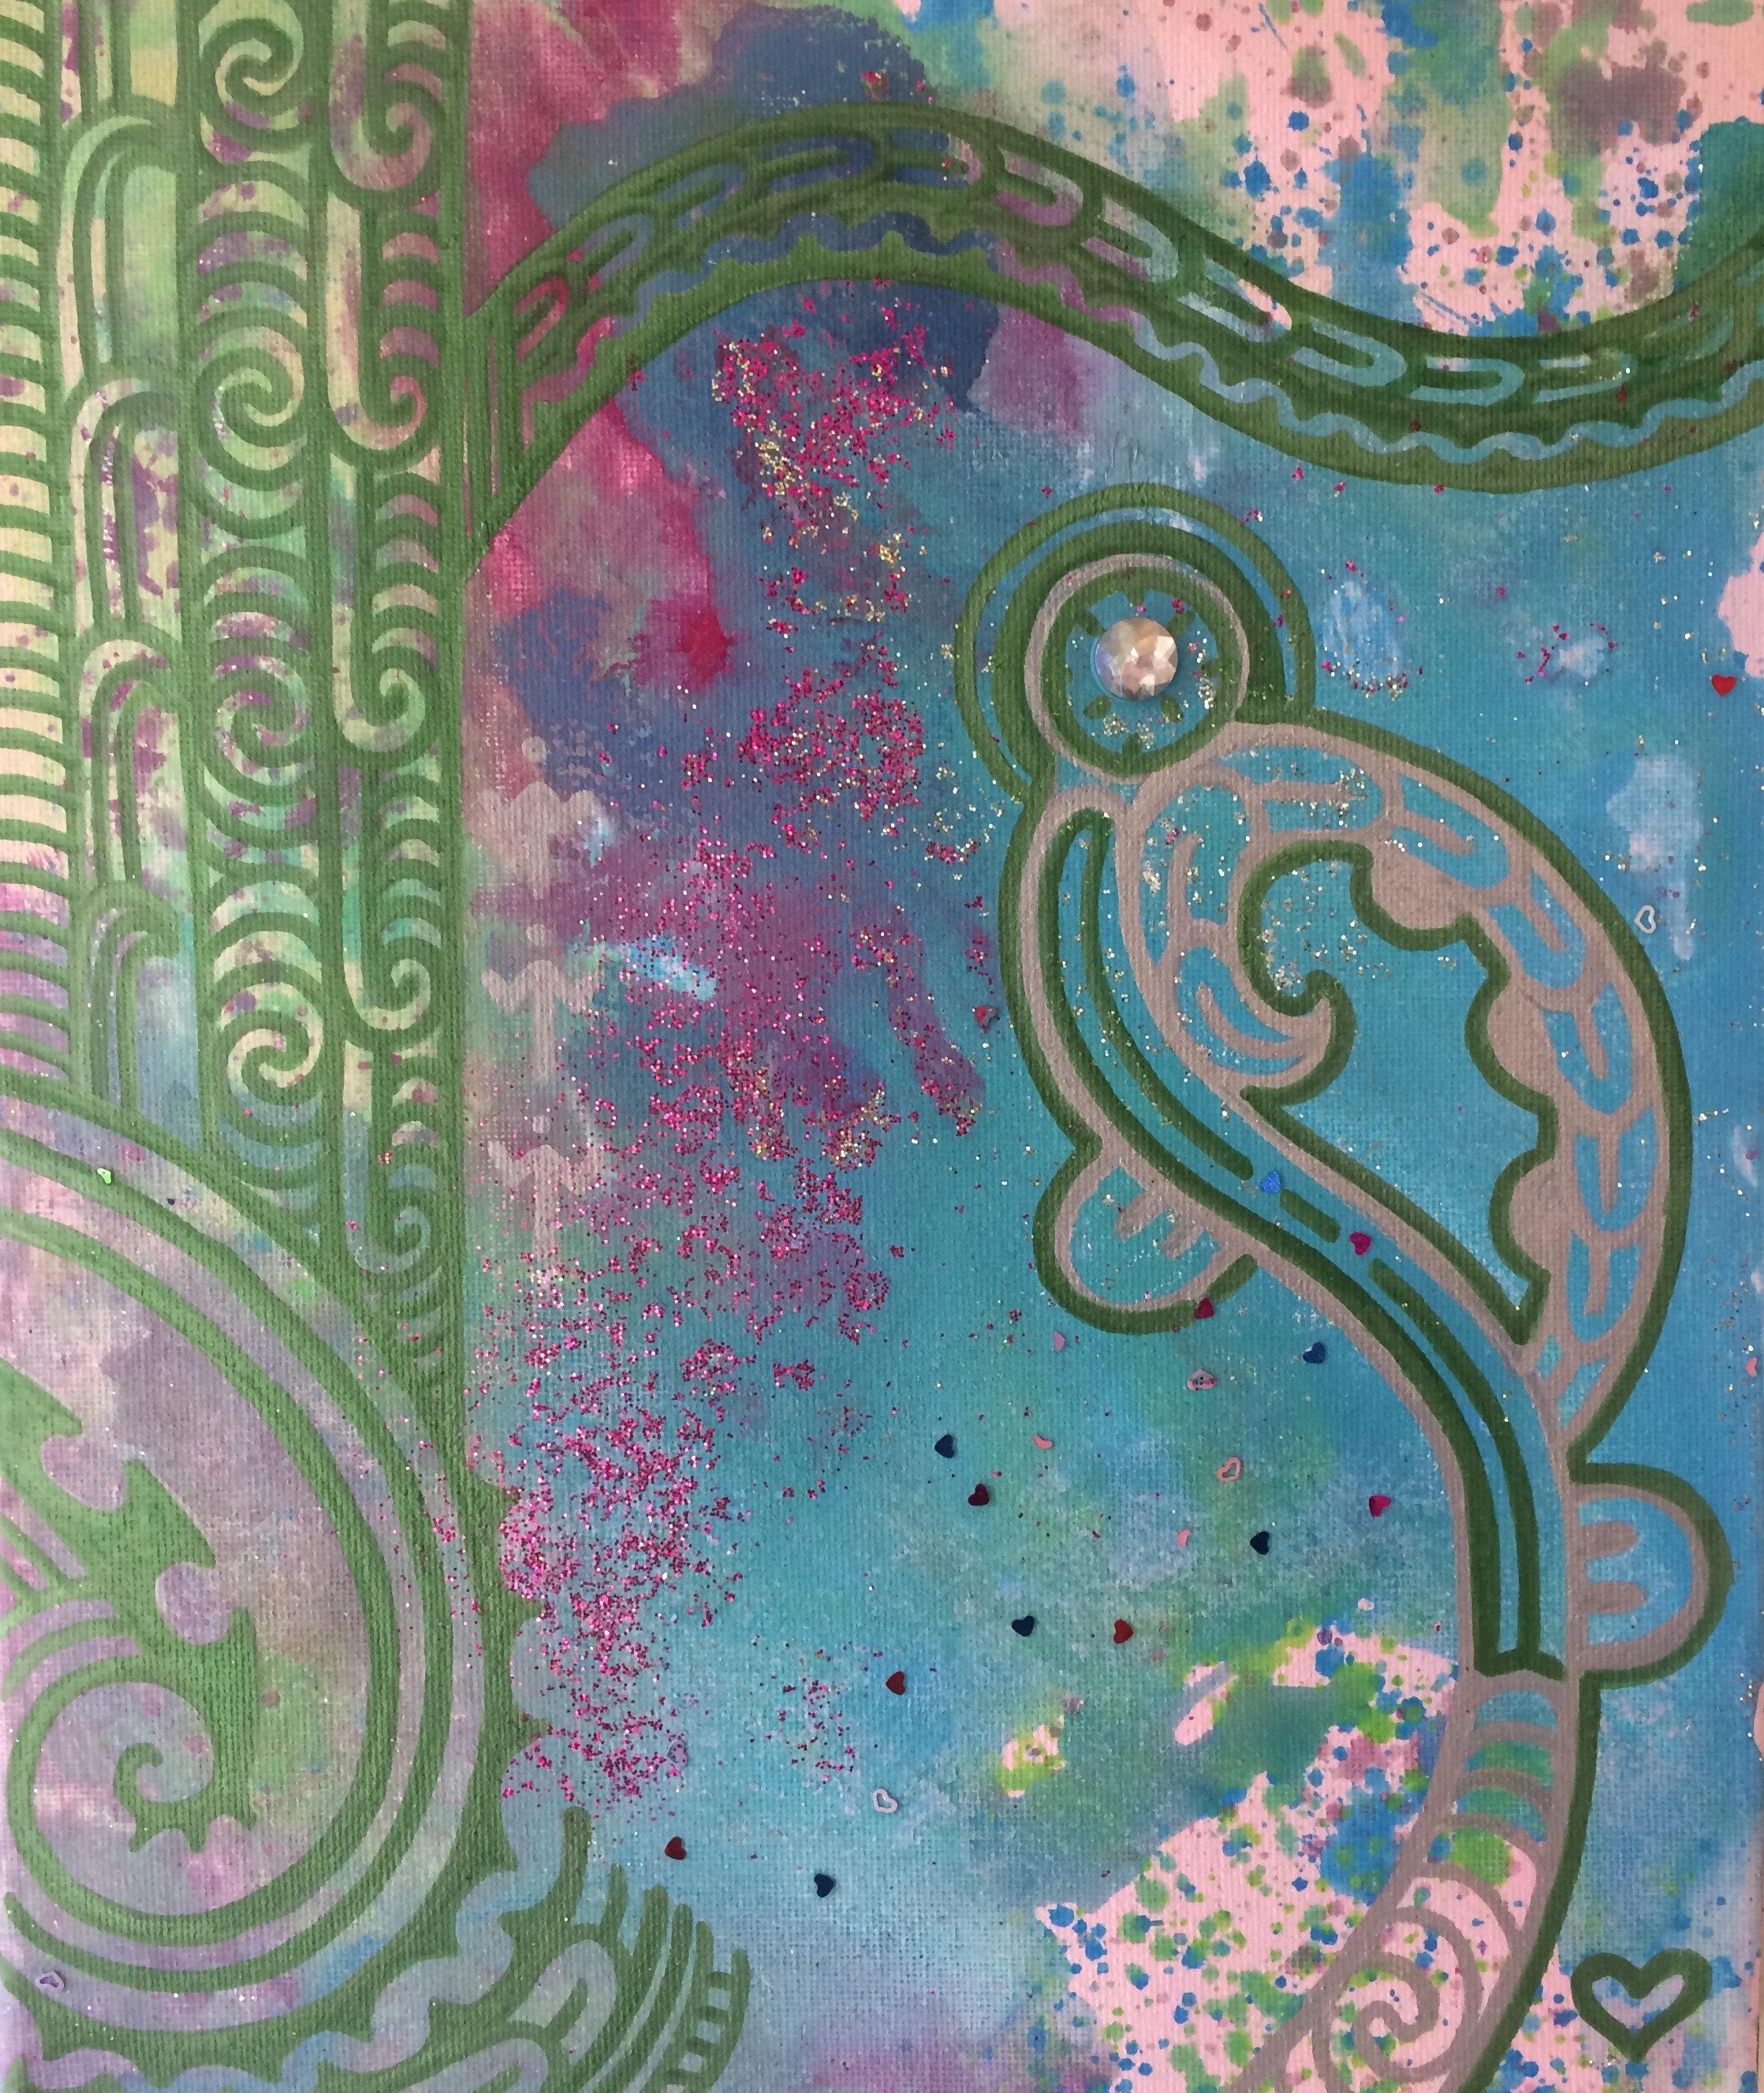 'Angels among us'  by Taryn Beri.